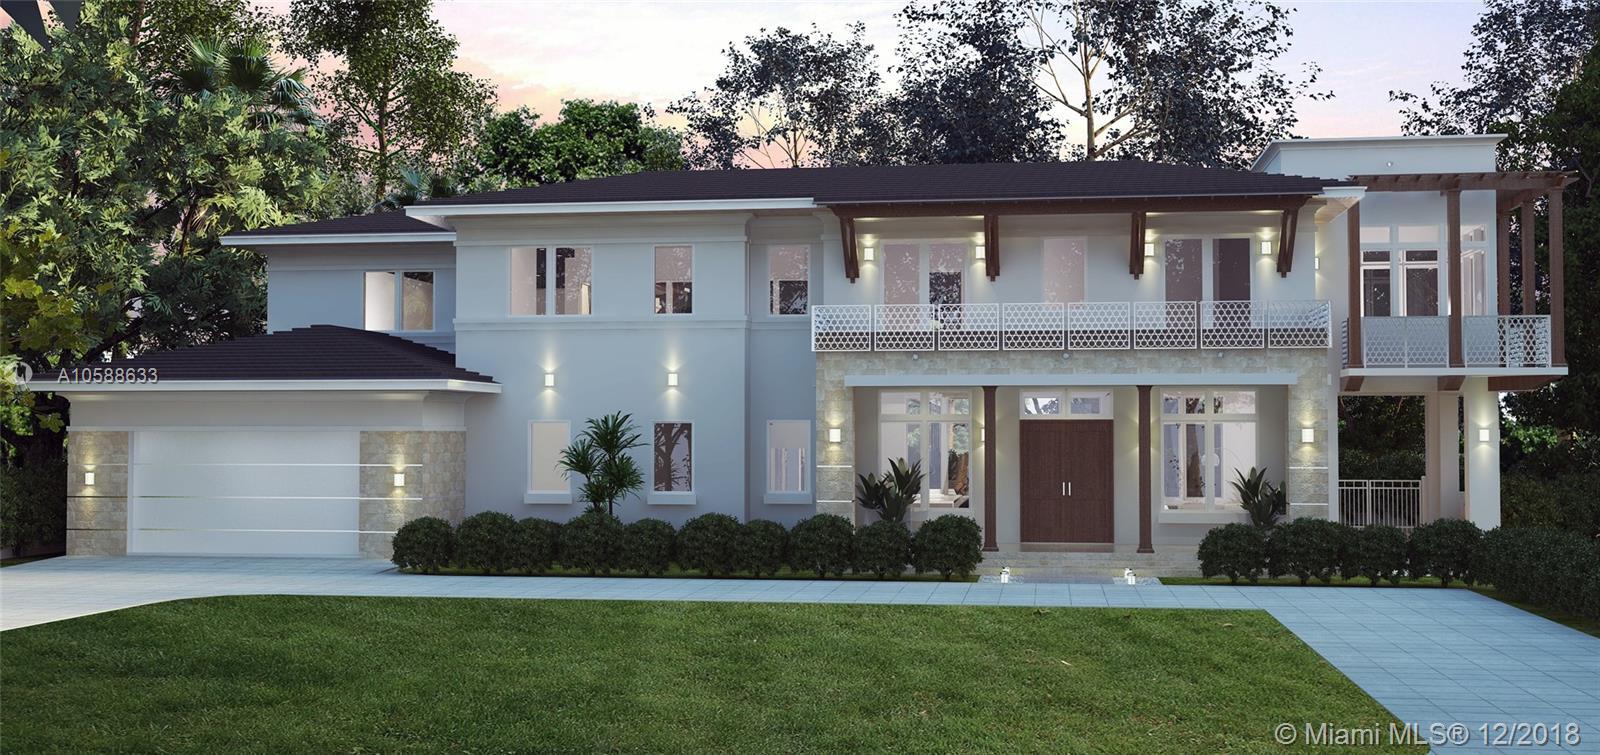 3226 Riviera Dr, Coral Gables, FL 33134